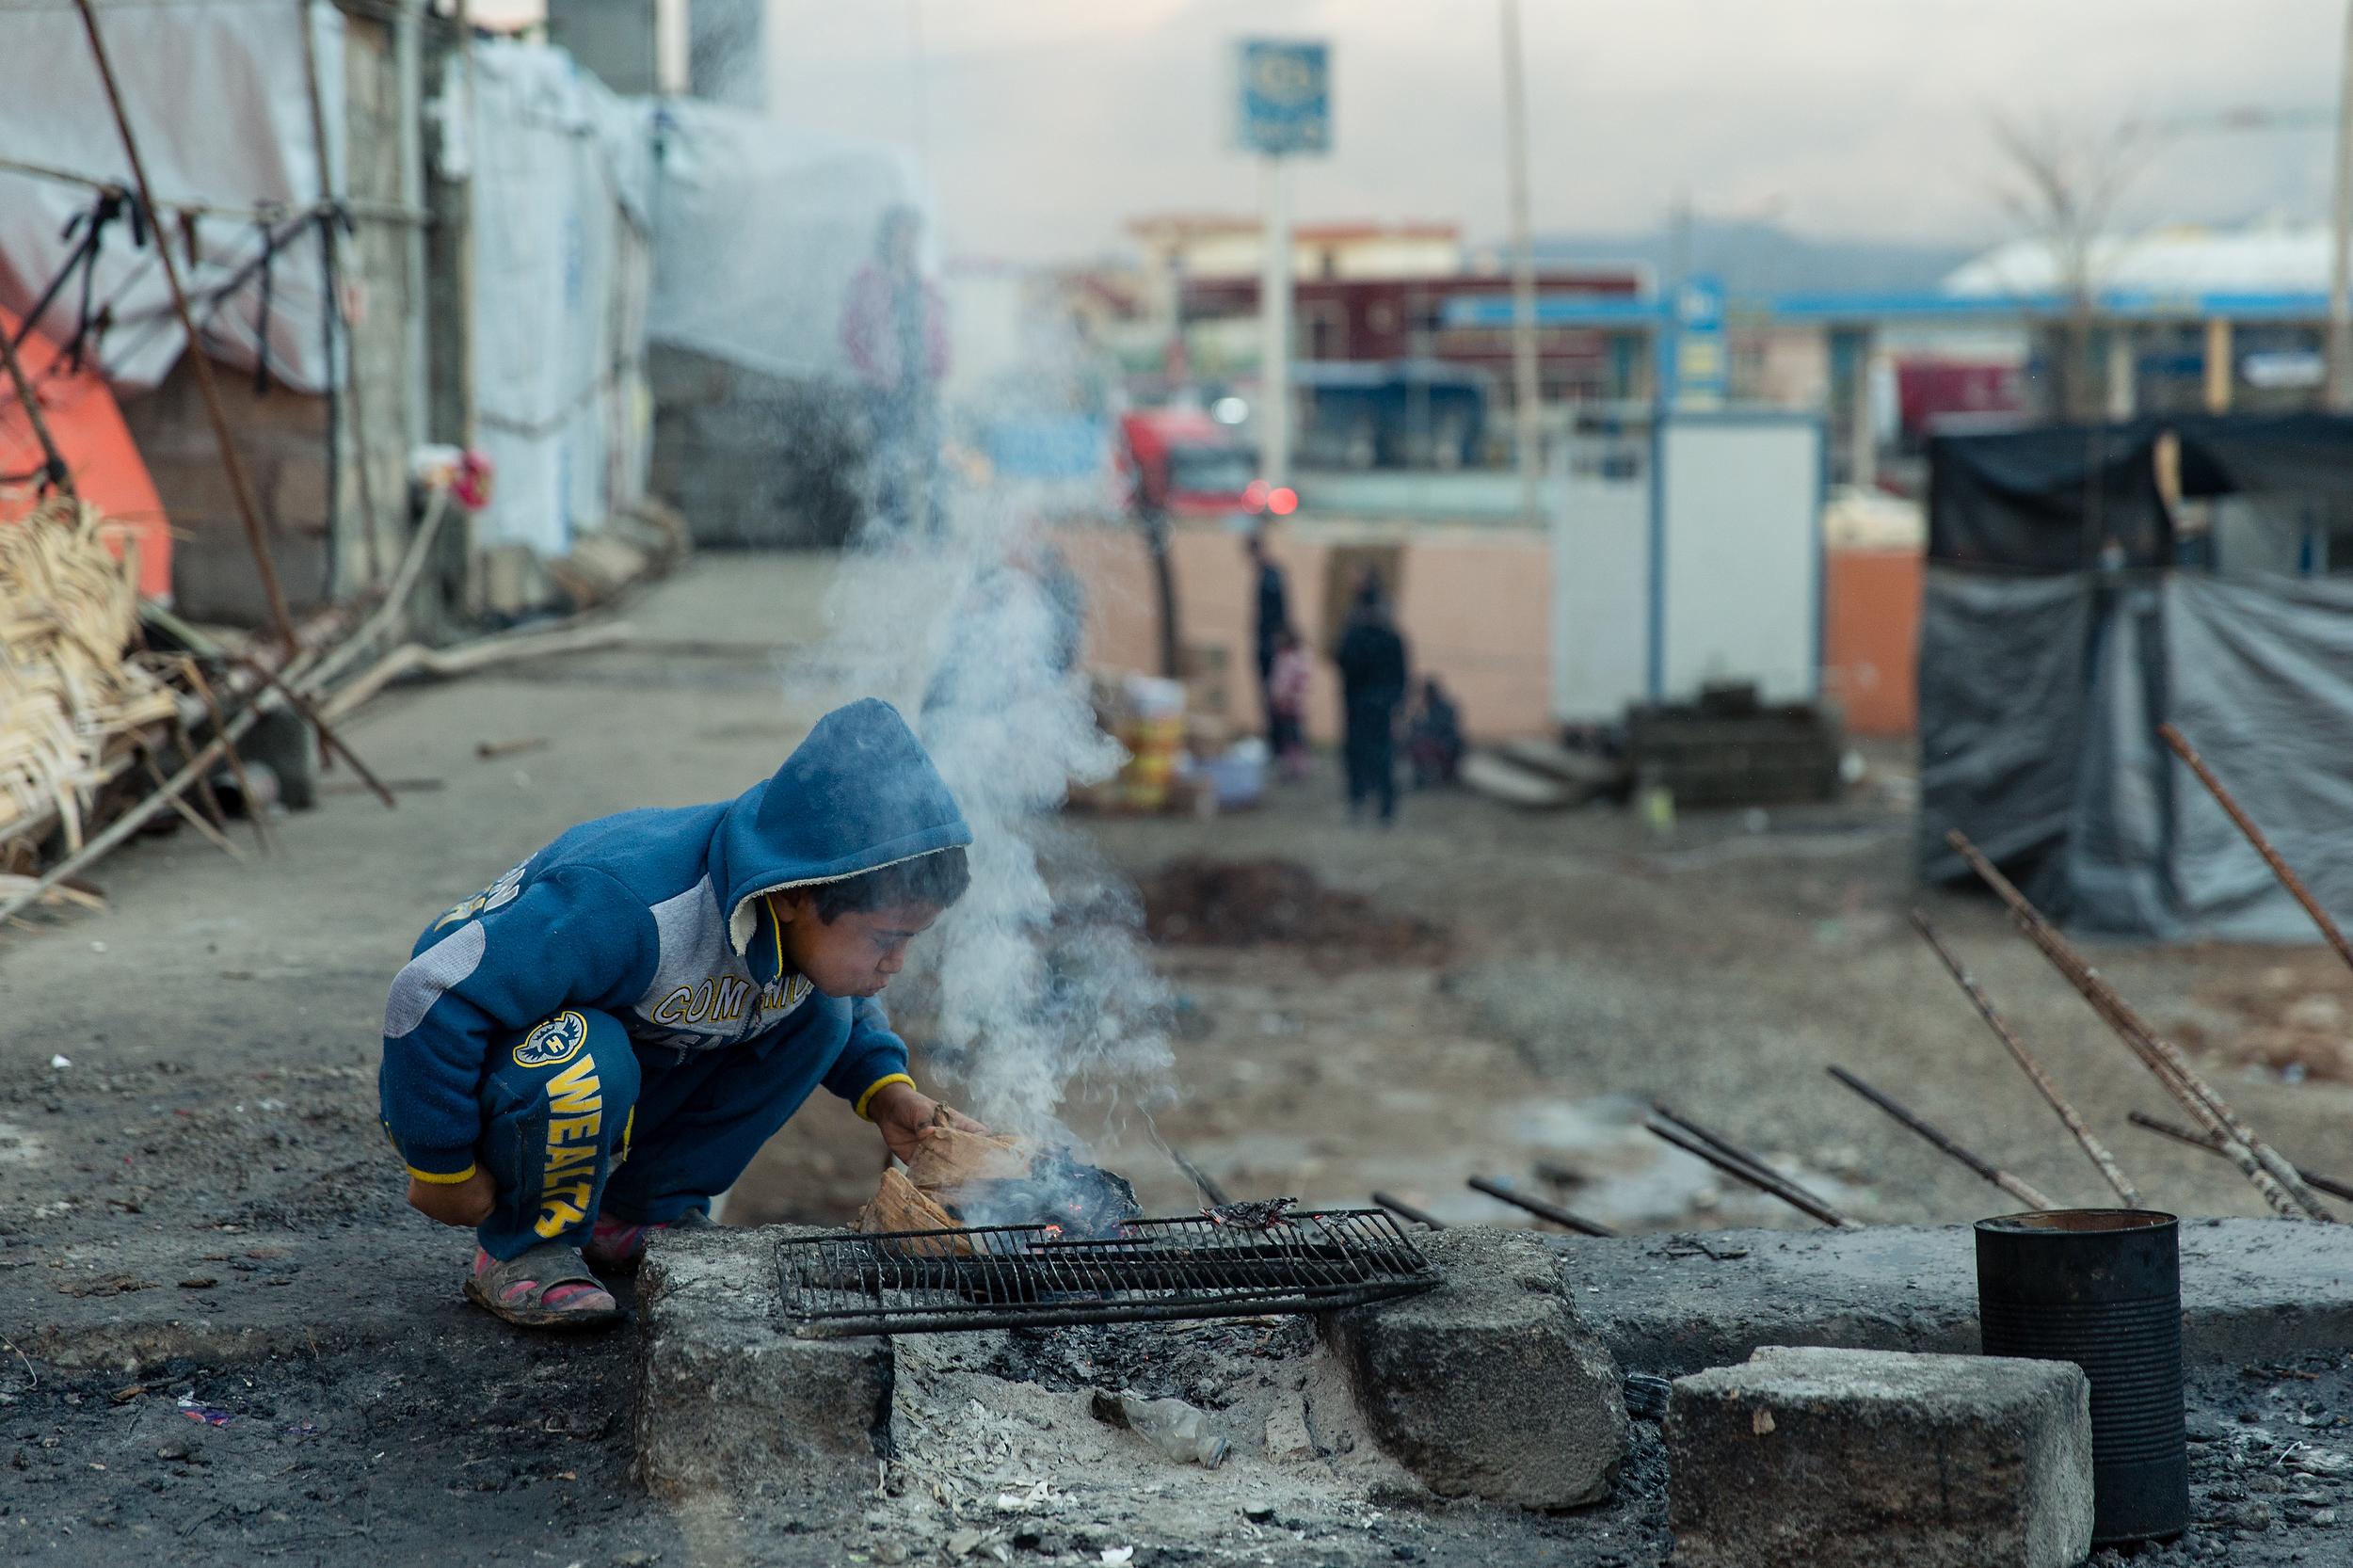 UNSERE WINTERHILFE IN SYRIEN